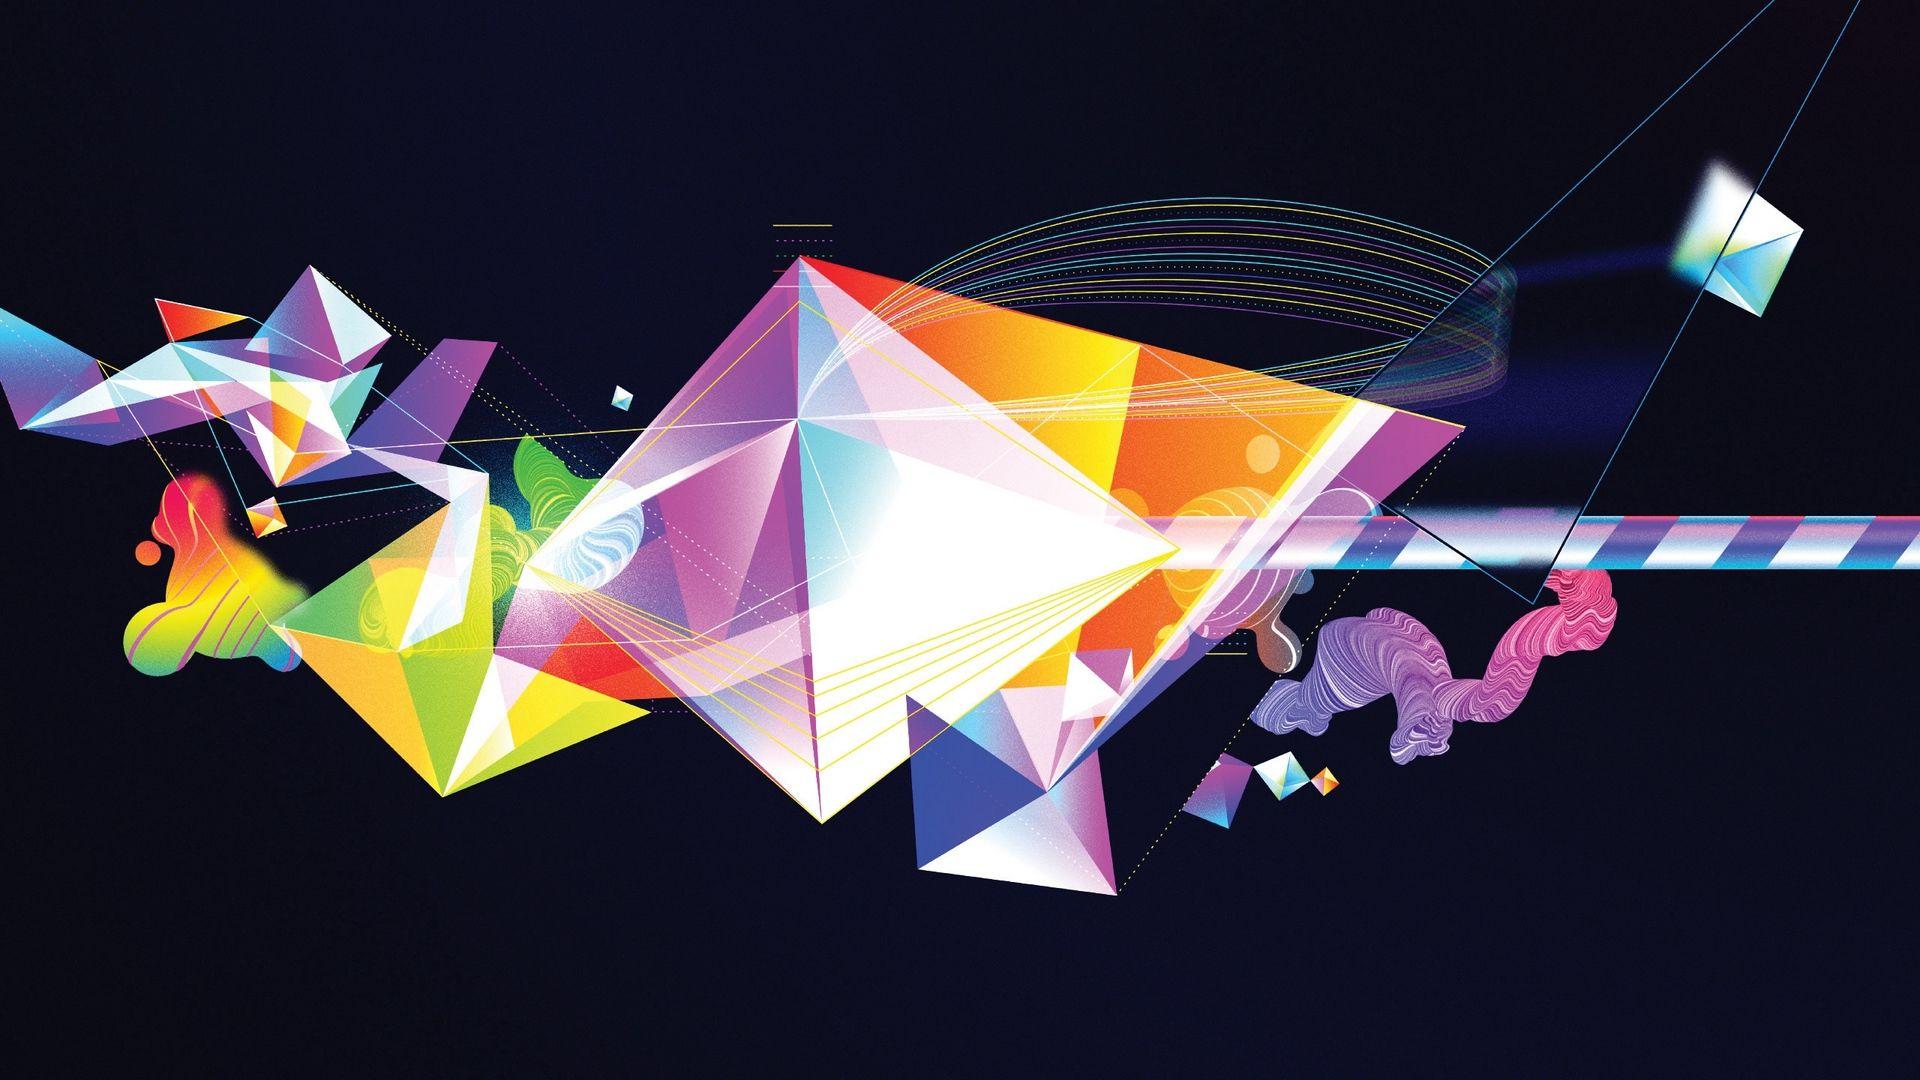 Graphic Design wallpaper background